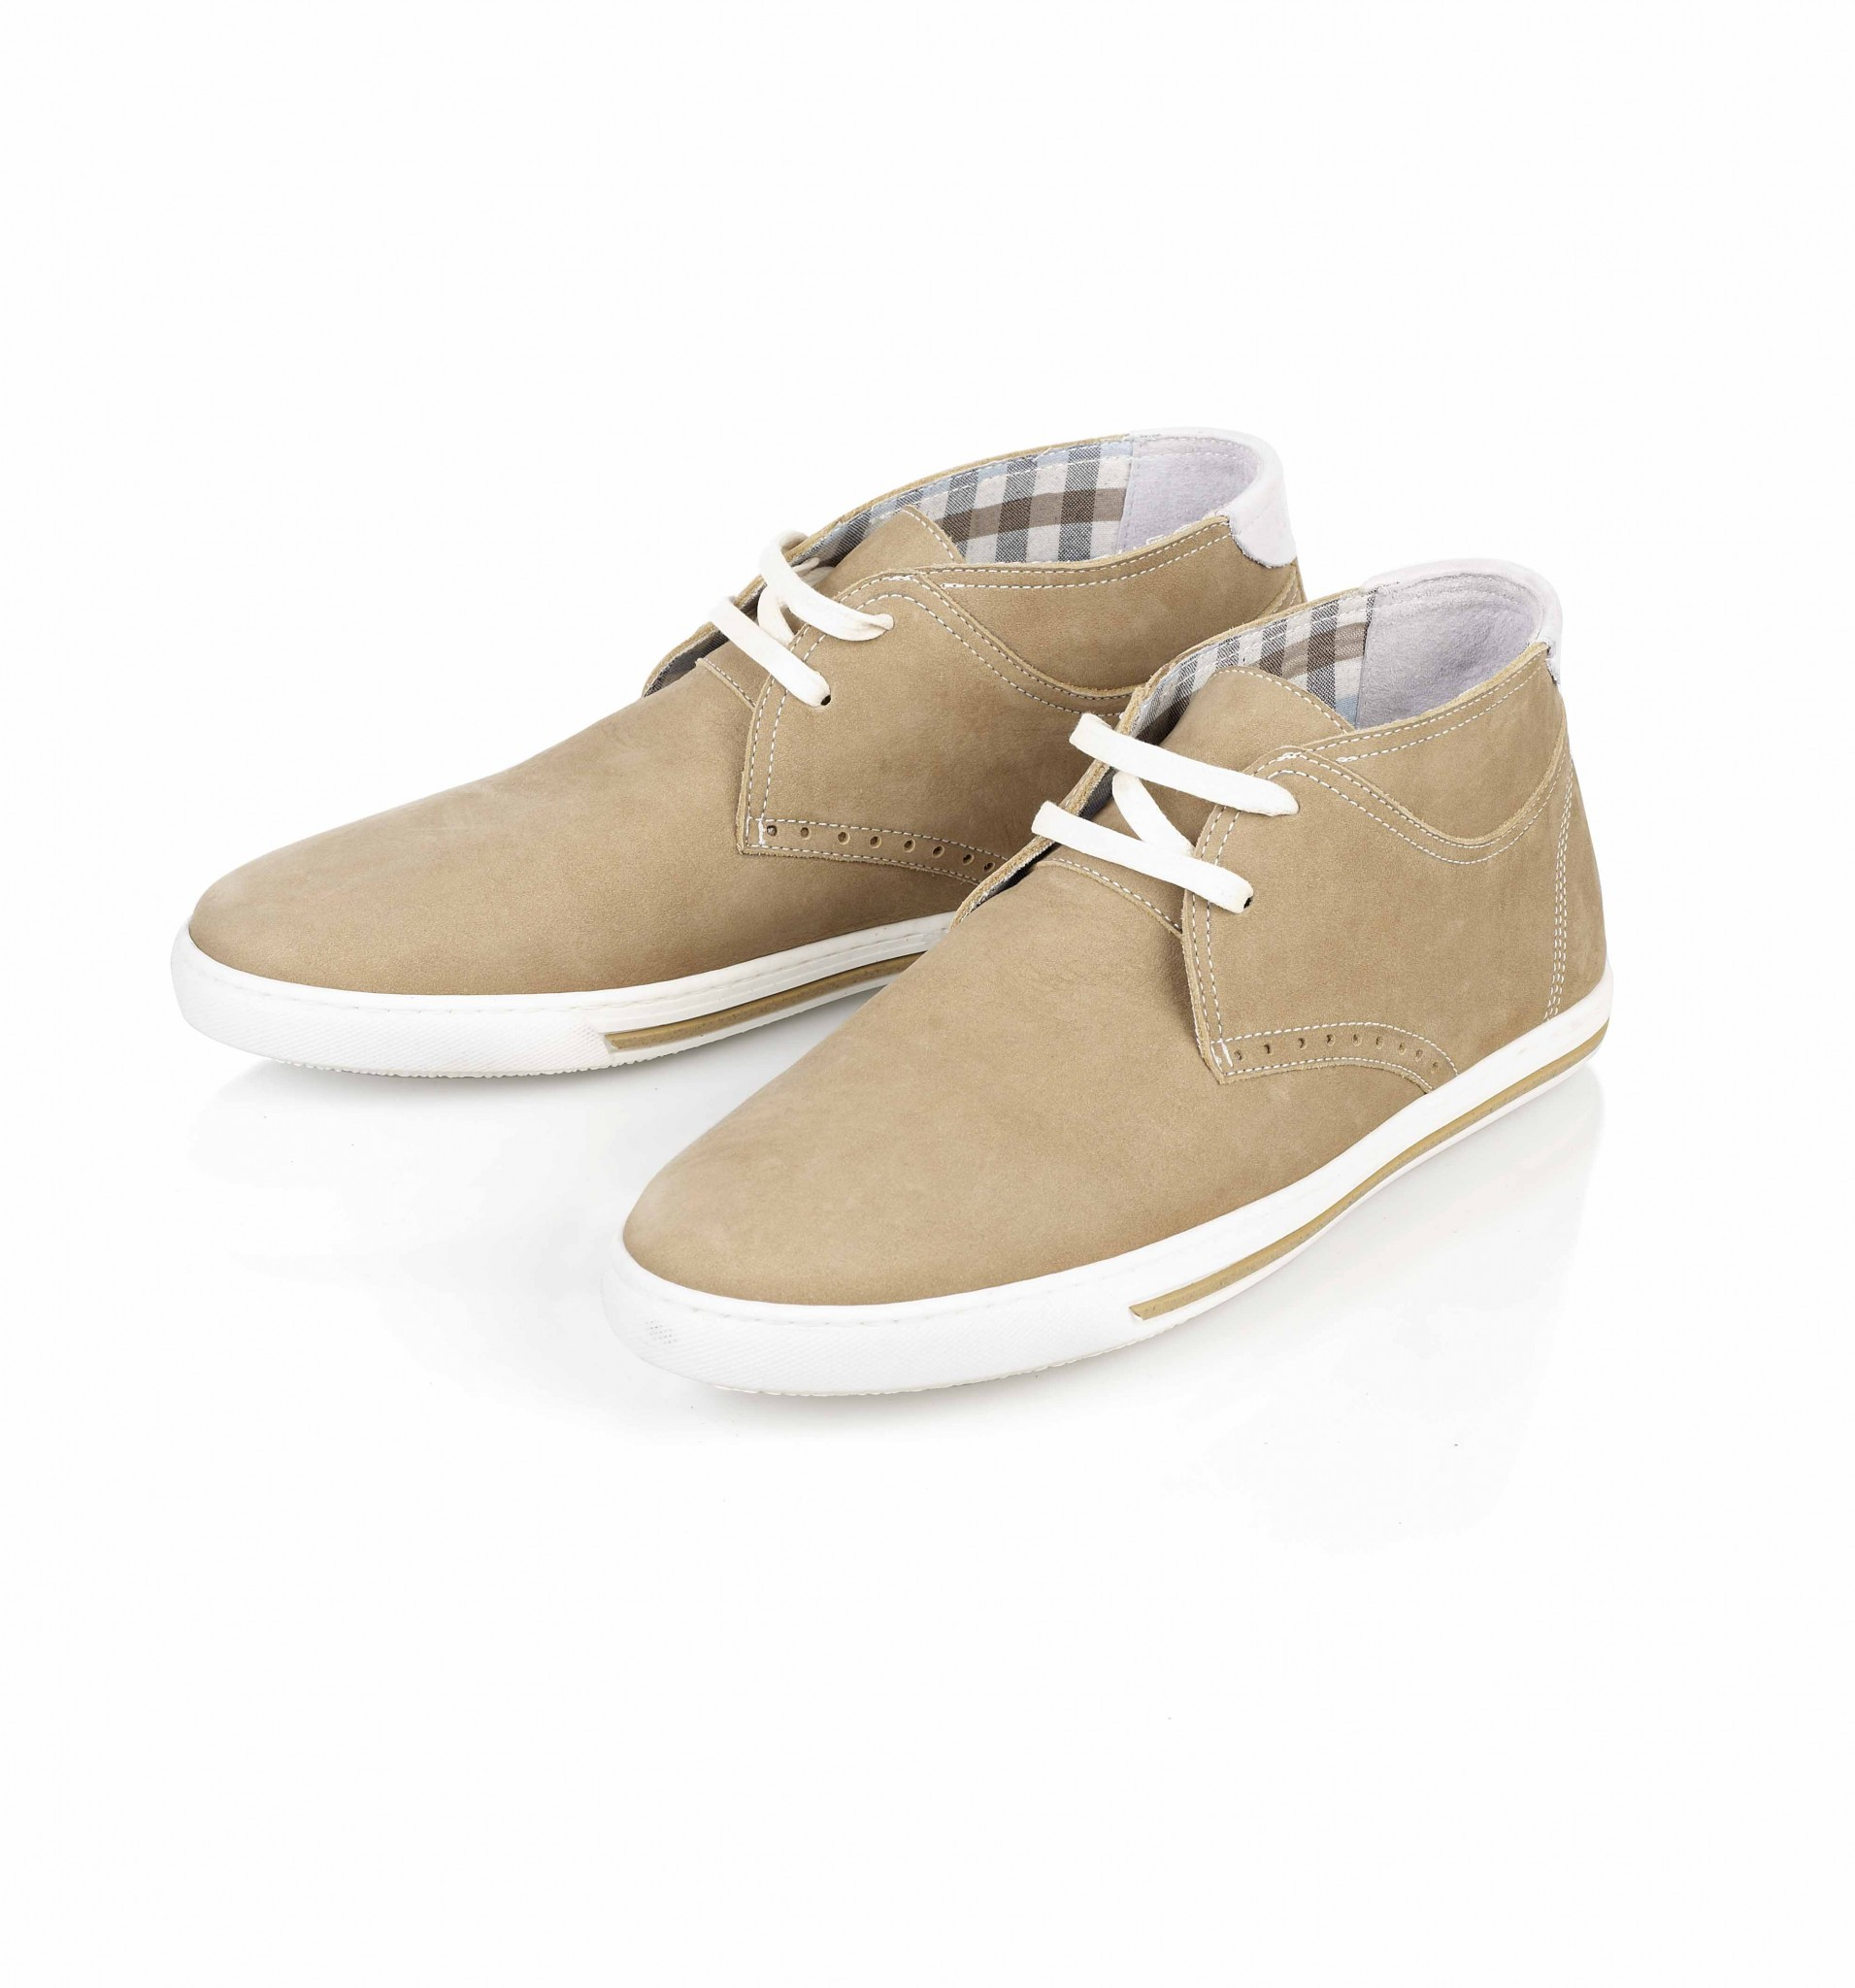 225 euros shoes